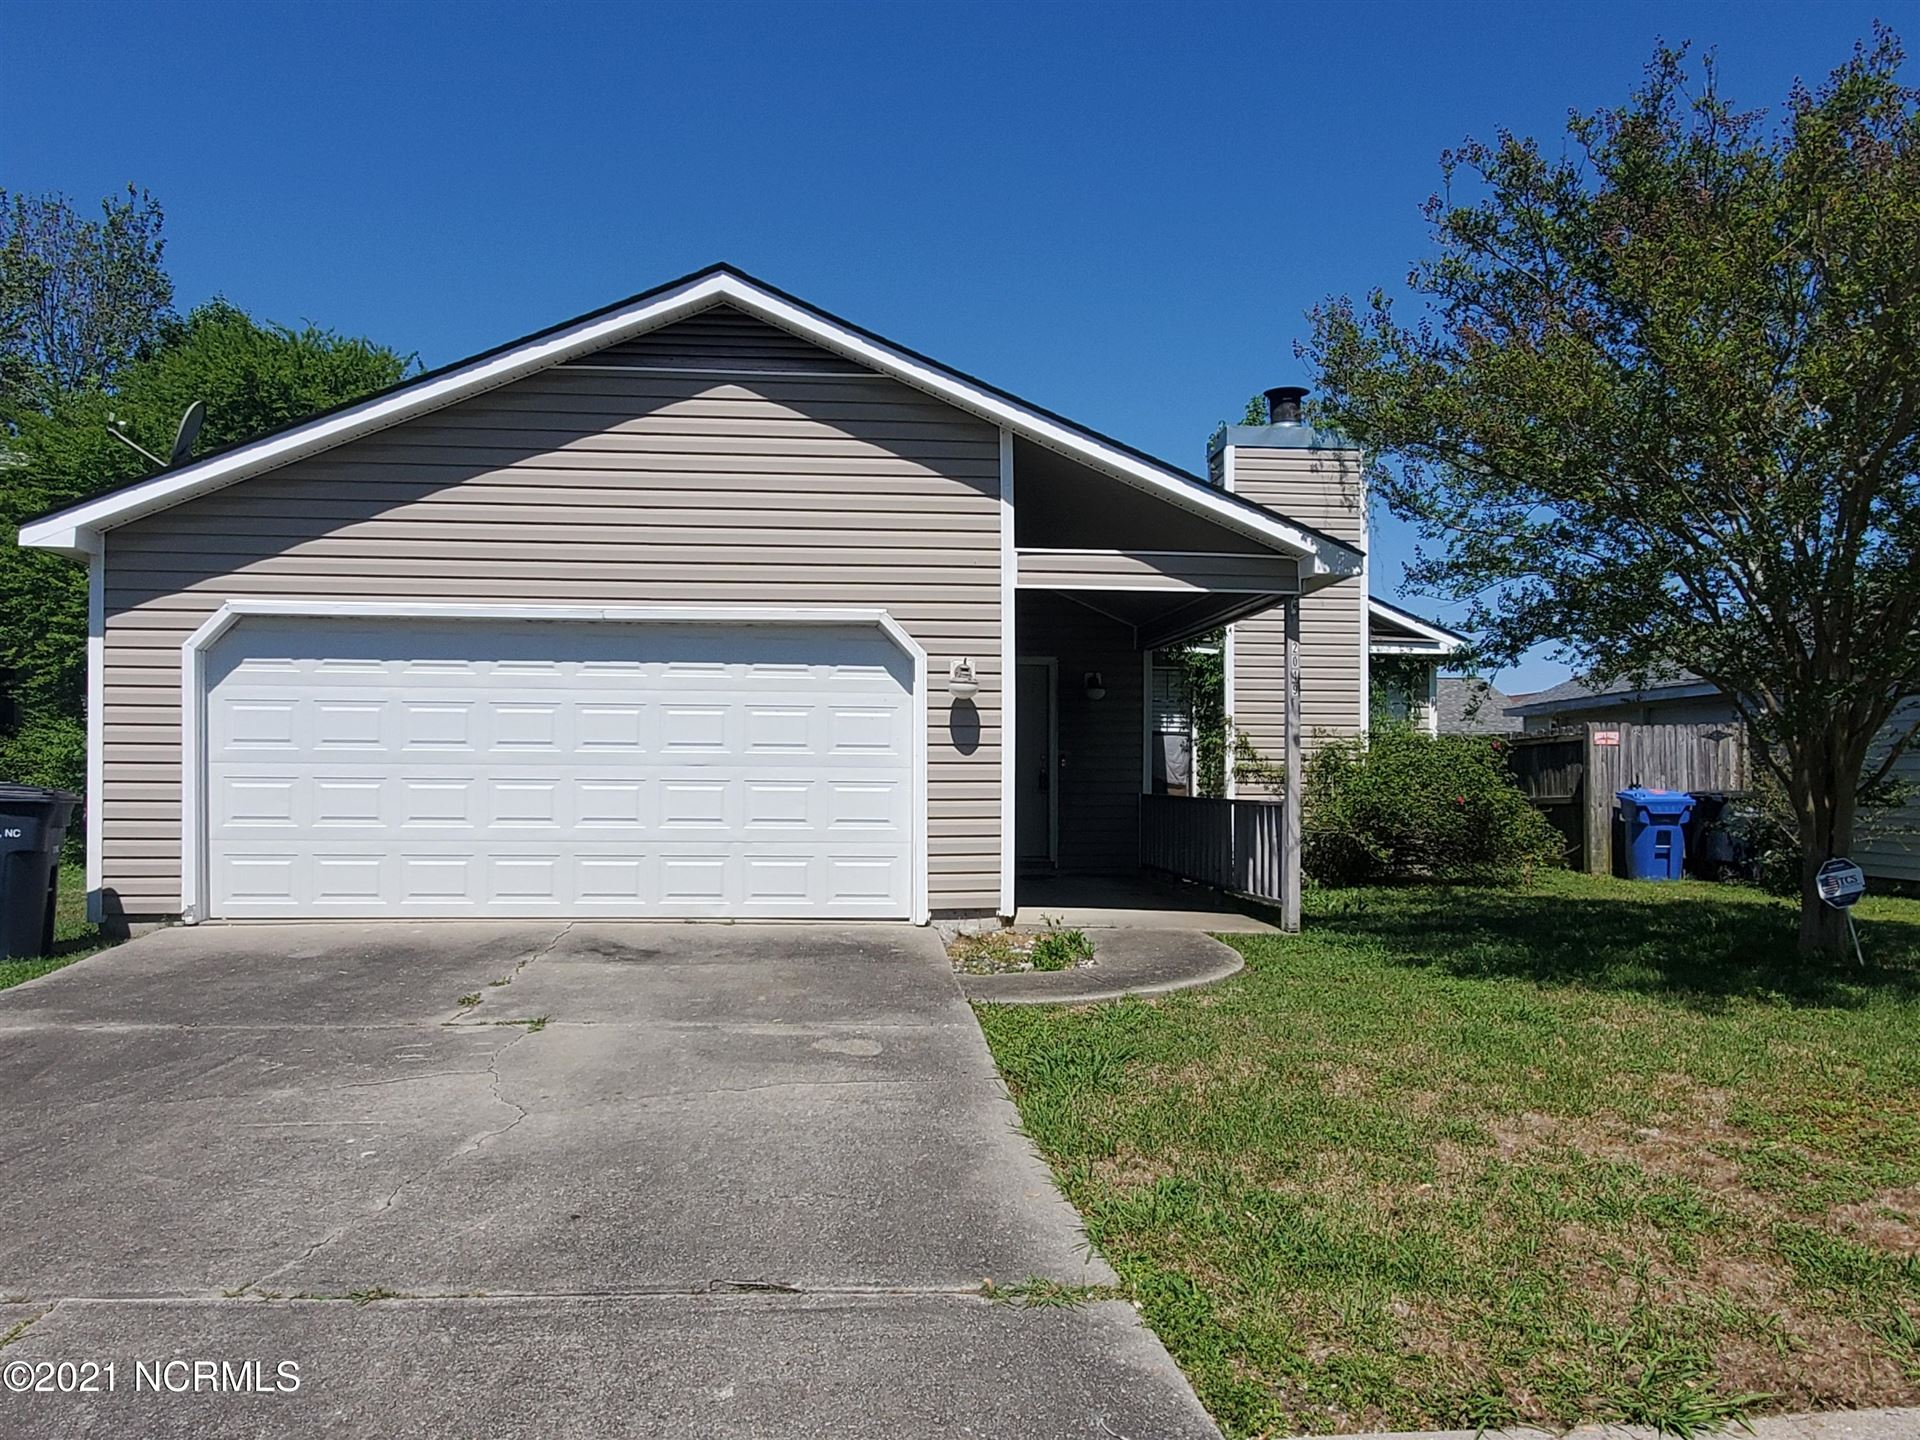 Photo of 2049 Foxhorn Road, Jacksonville, NC 28546 (MLS # 100266324)